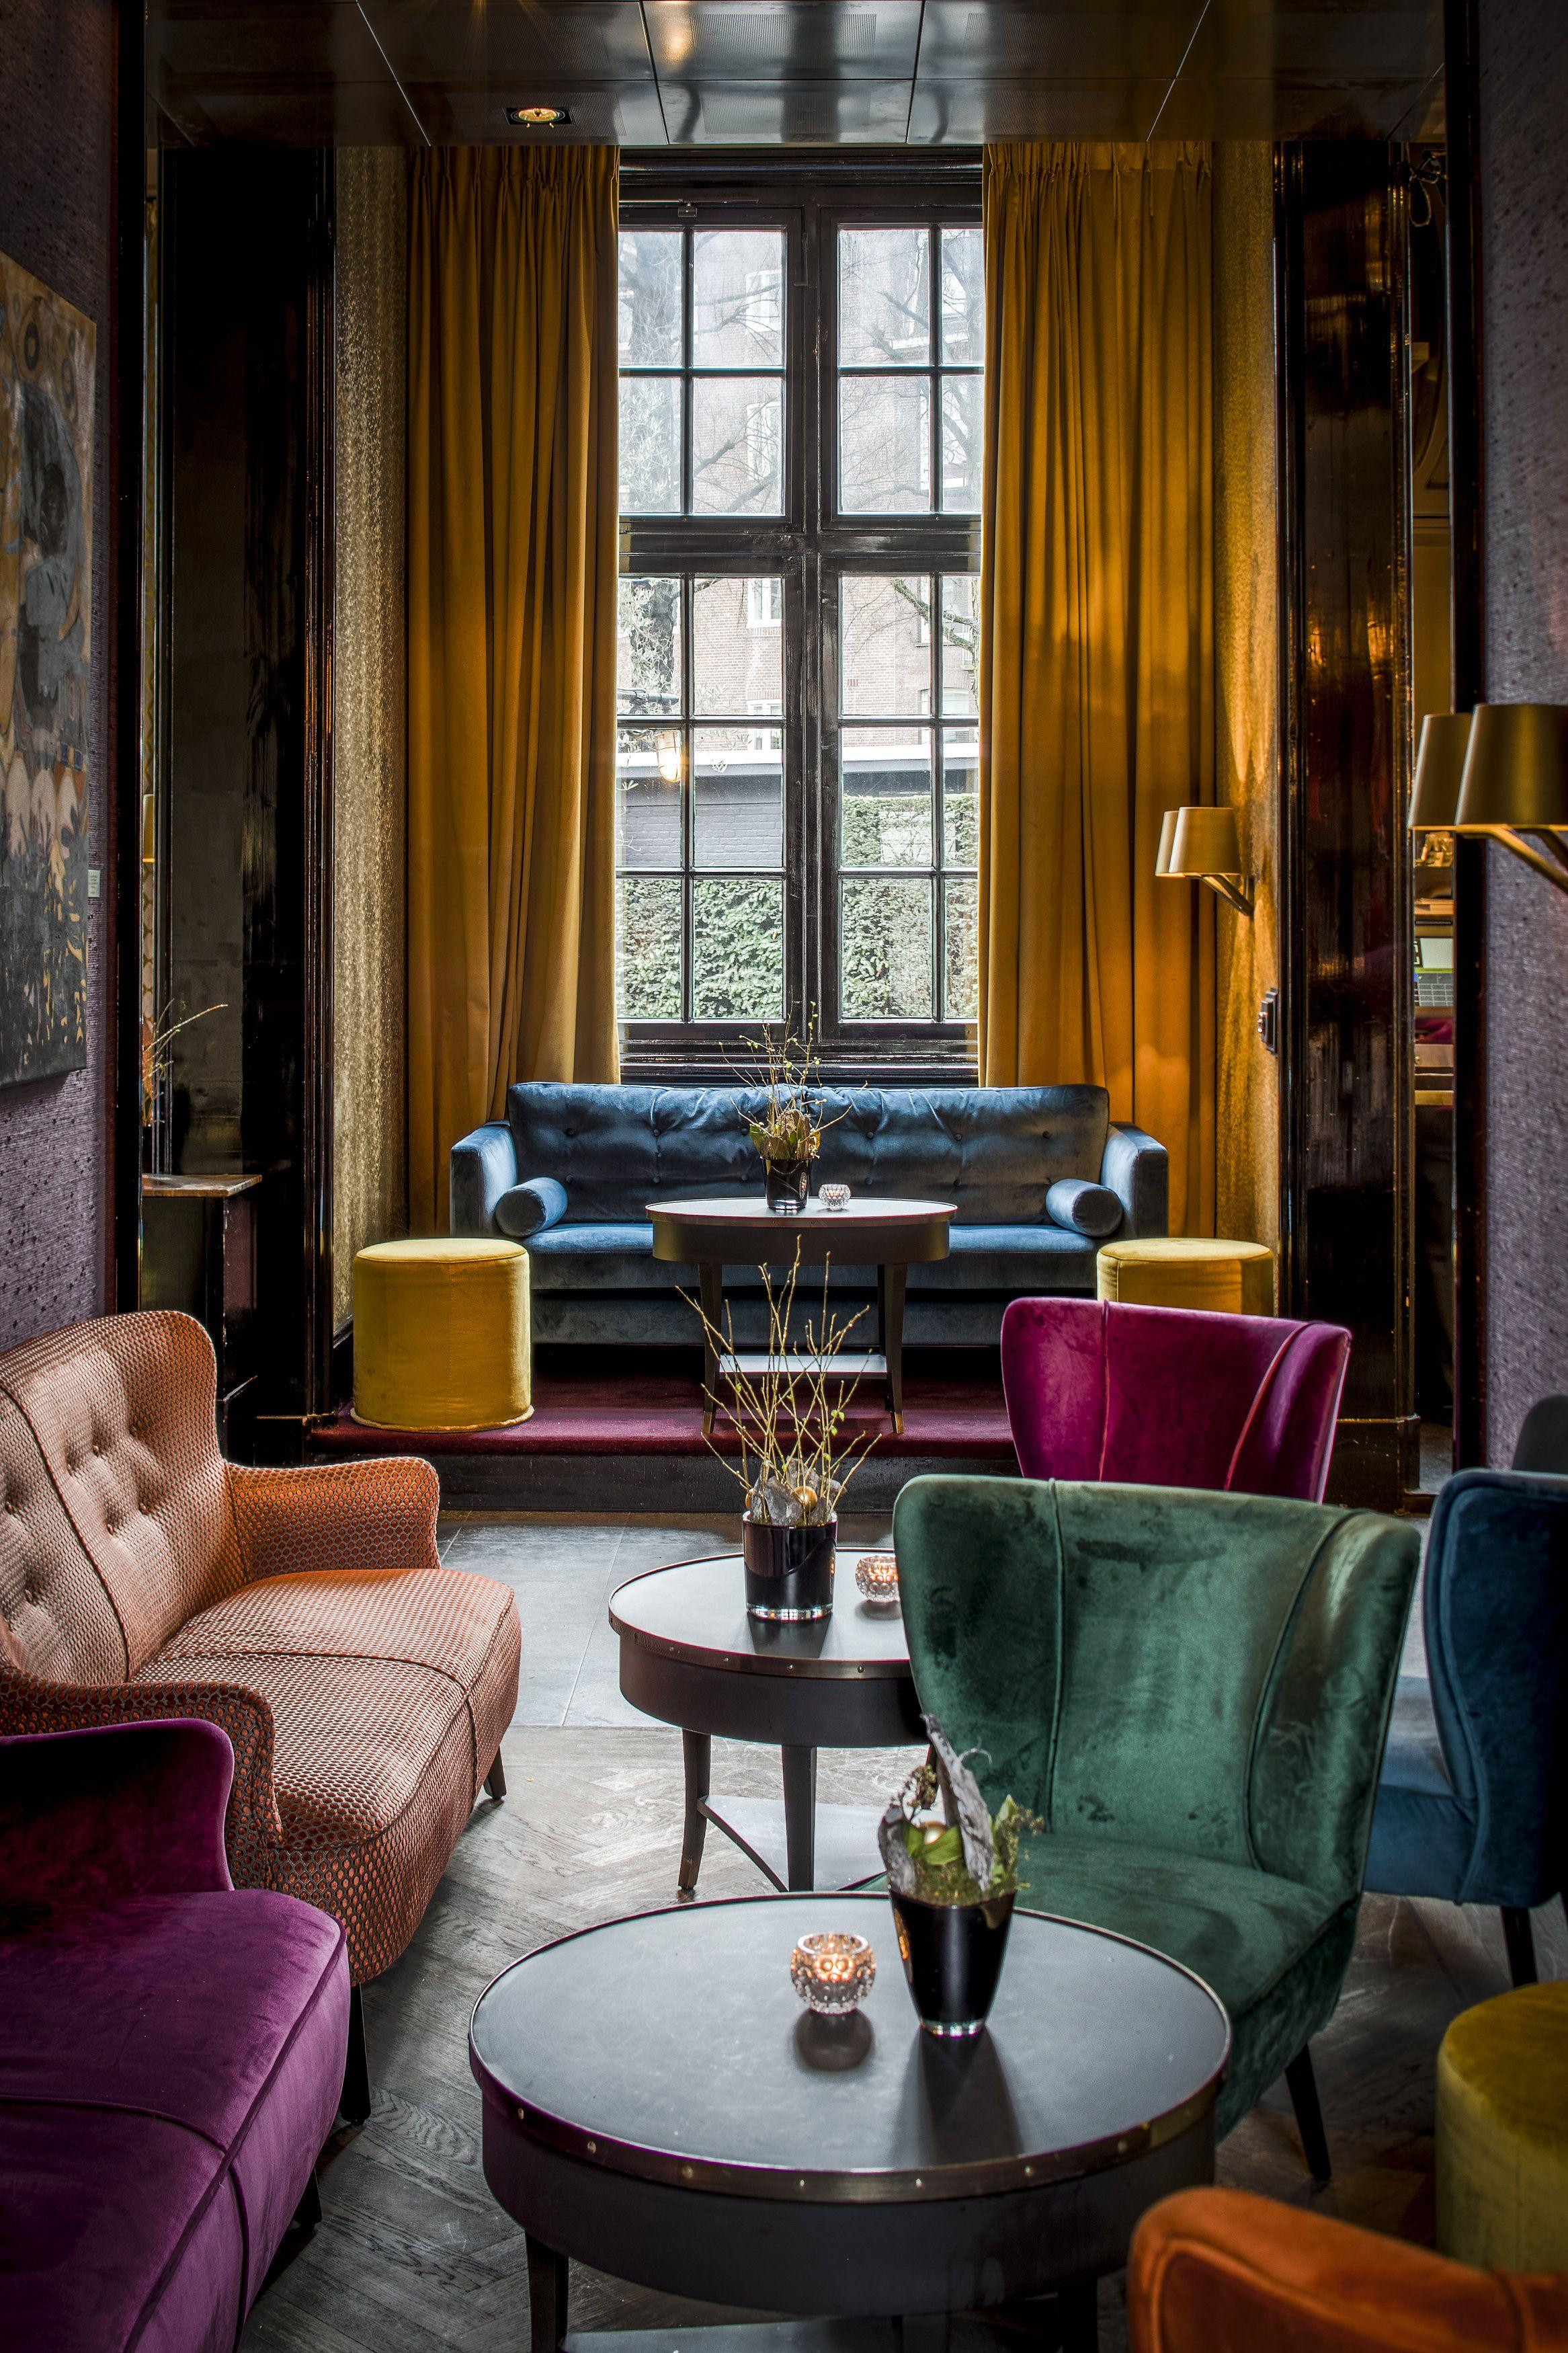 Hotel College, Amsterdam